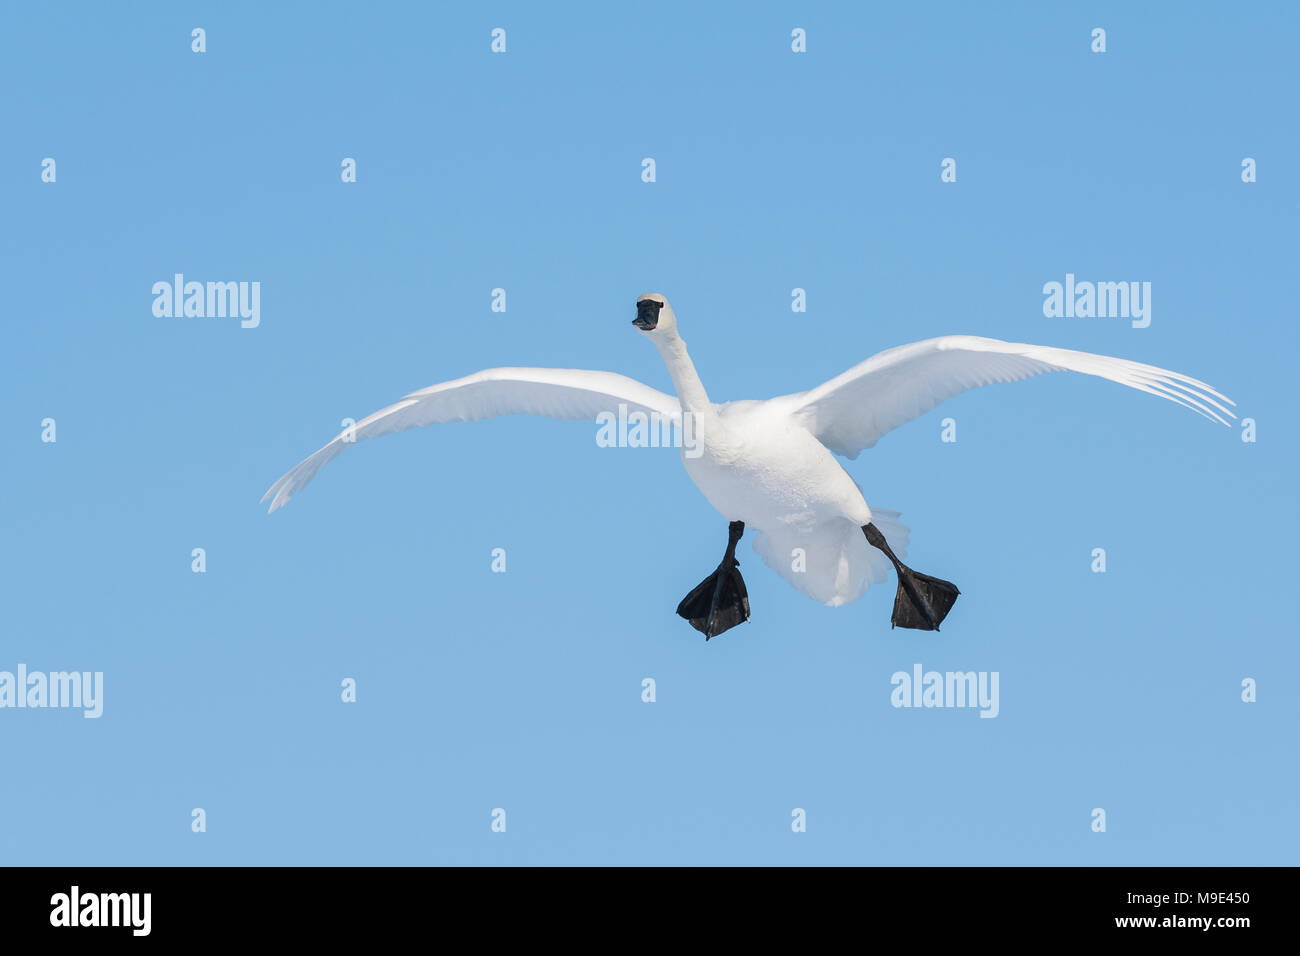 Trumpeter swan (Cygnus buccinatore) in atterraggio a St. Croix River, WI, Stati Uniti d'America, a metà gennaio, da Dominique Braud/Dembinsky Foto Assoc Immagini Stock